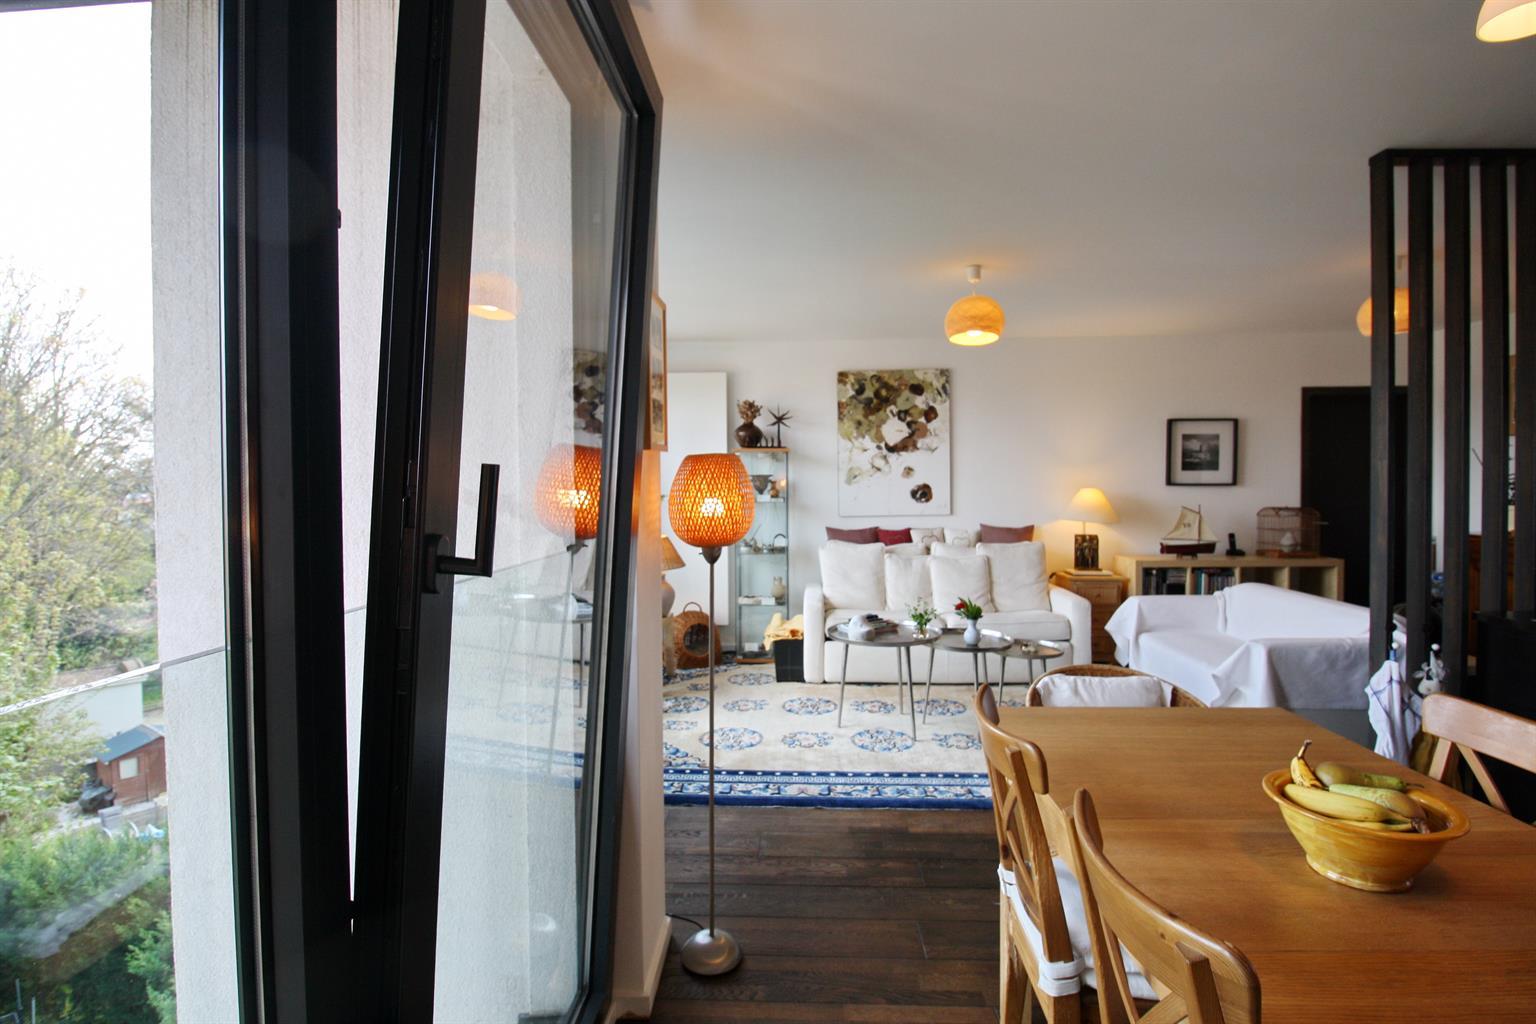 Penthouse - Berchem-Sainte-Agathe - #4346071-9